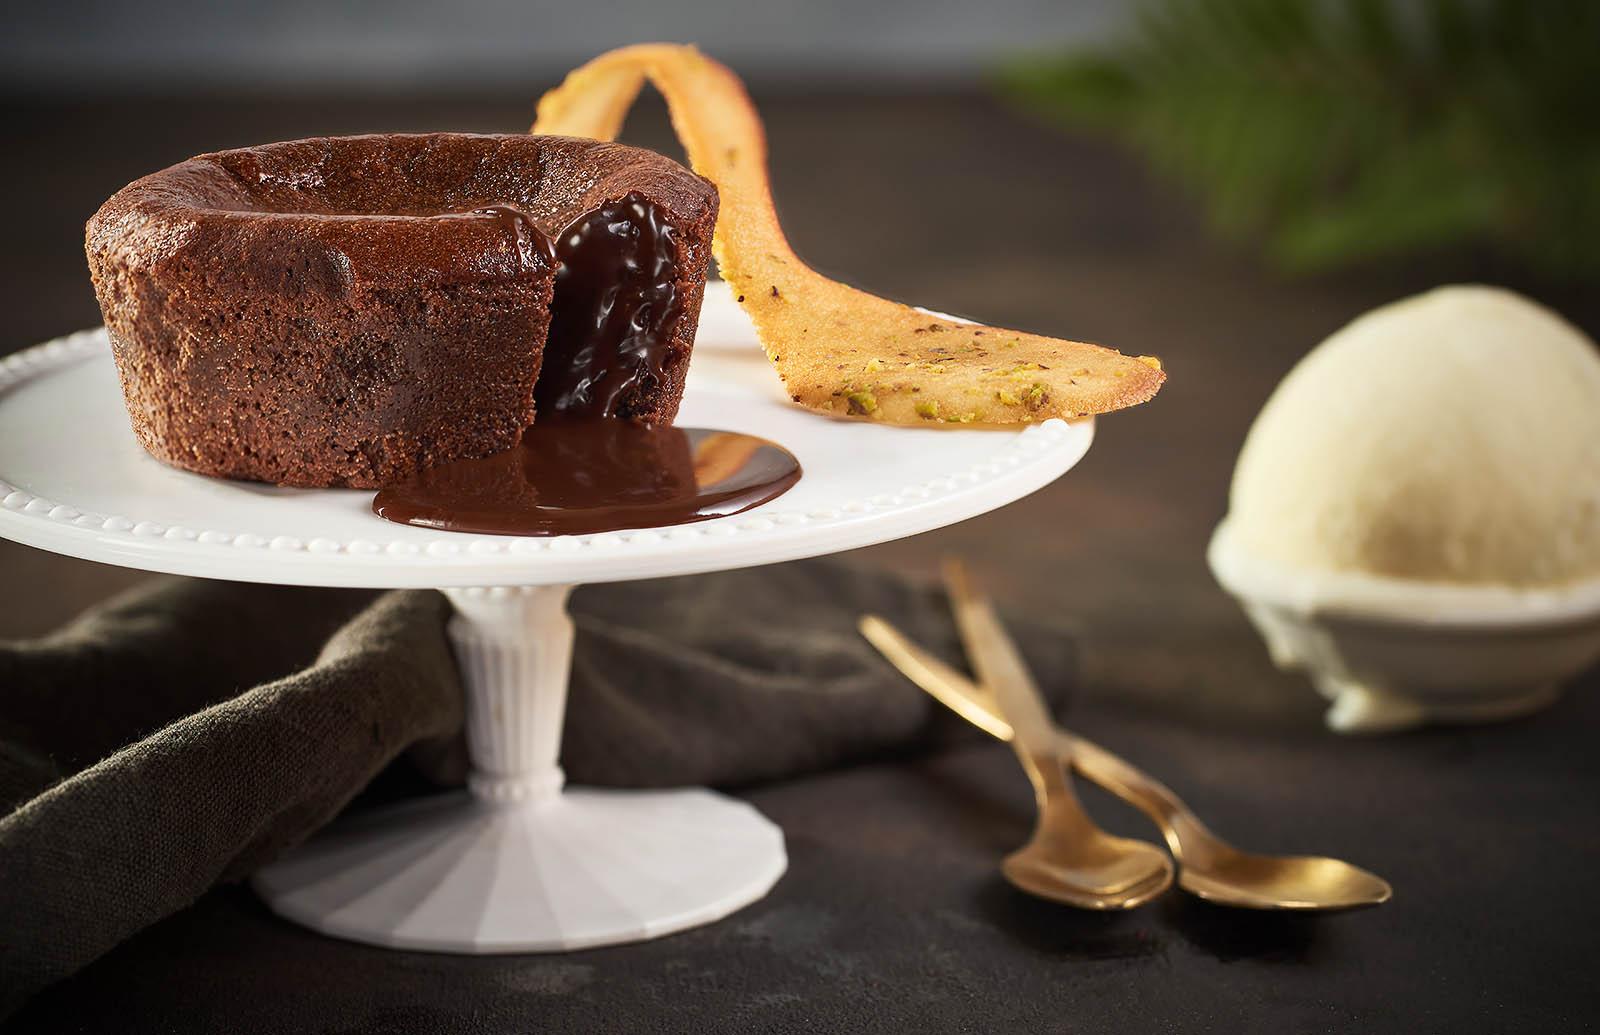 Molten cake - the molten restaurant